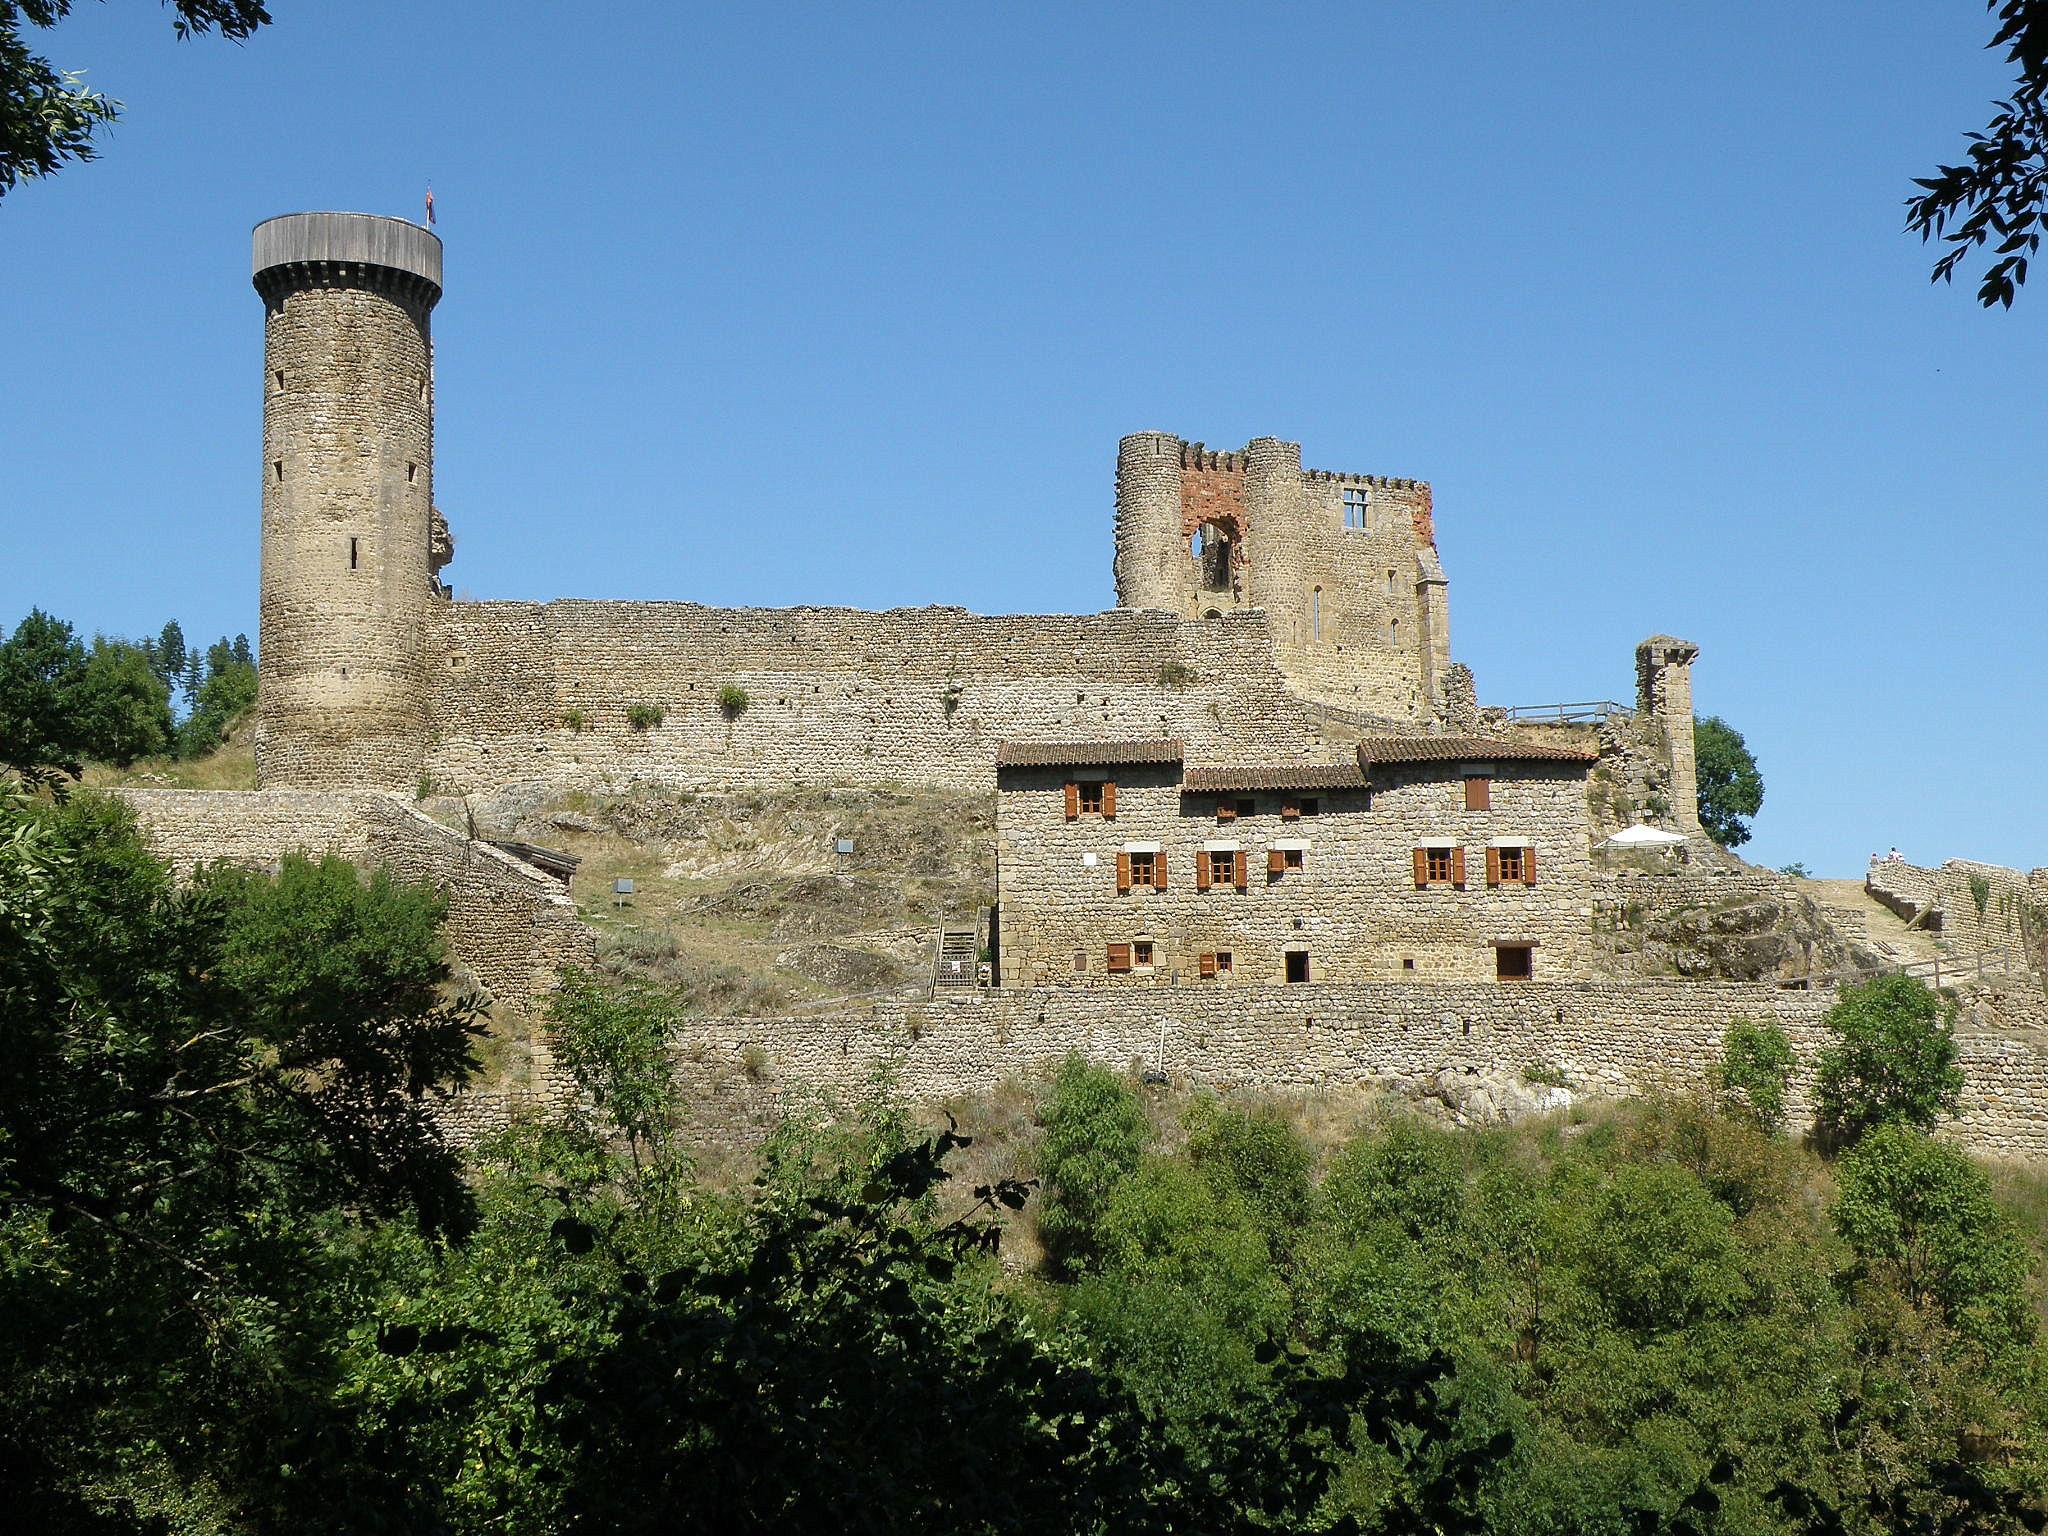 252-chateau_rochebaron_43.jpg